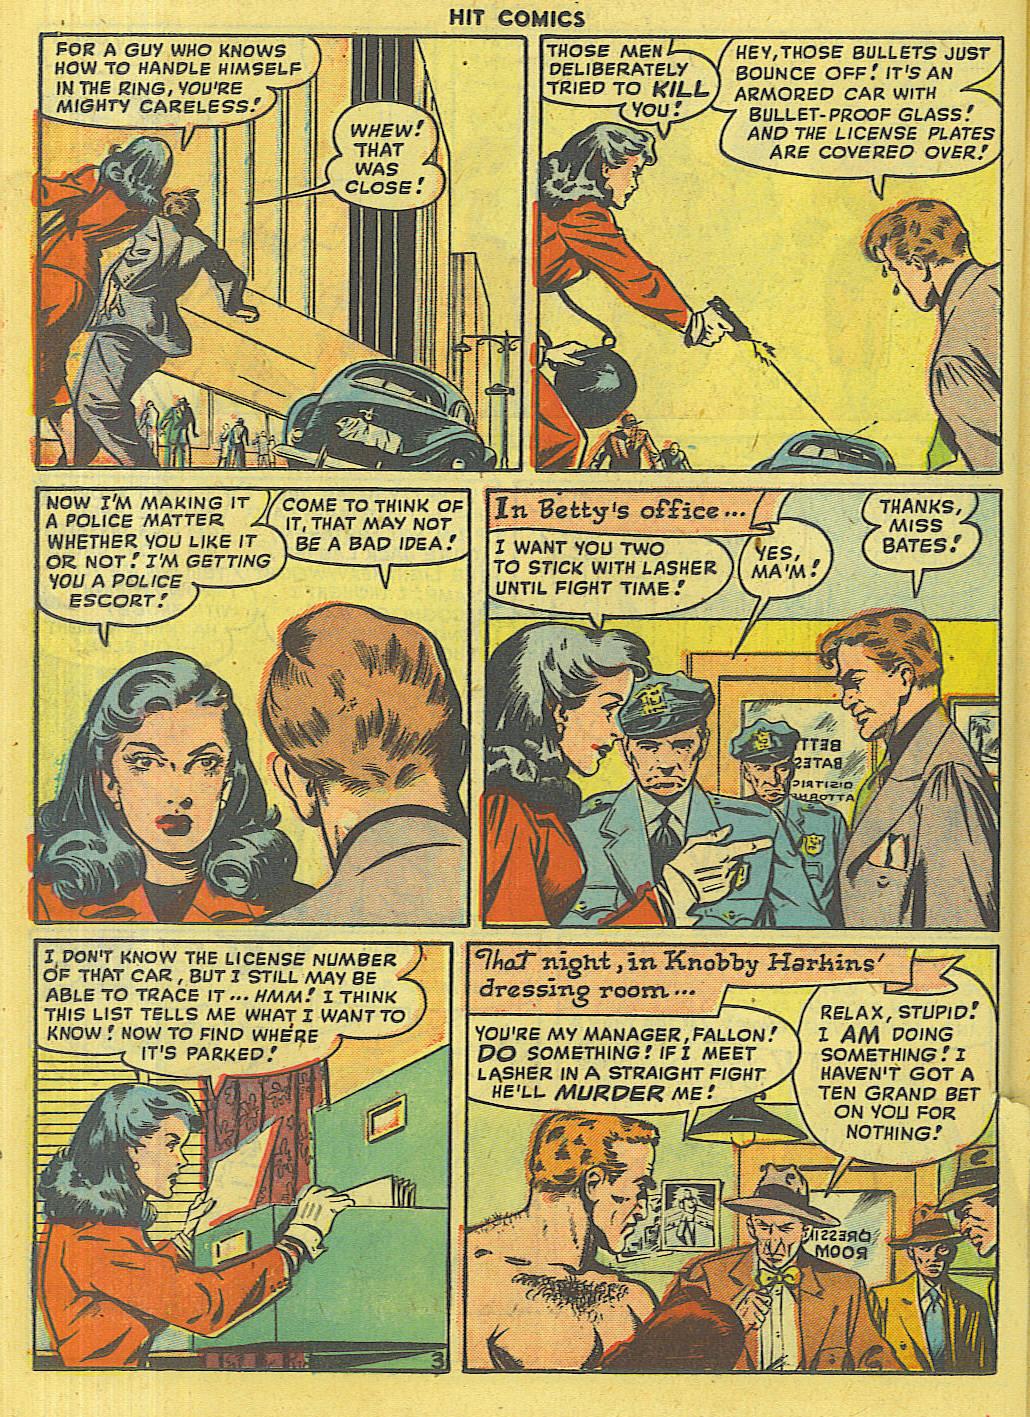 Read online Hit Comics comic -  Issue #56 - 34